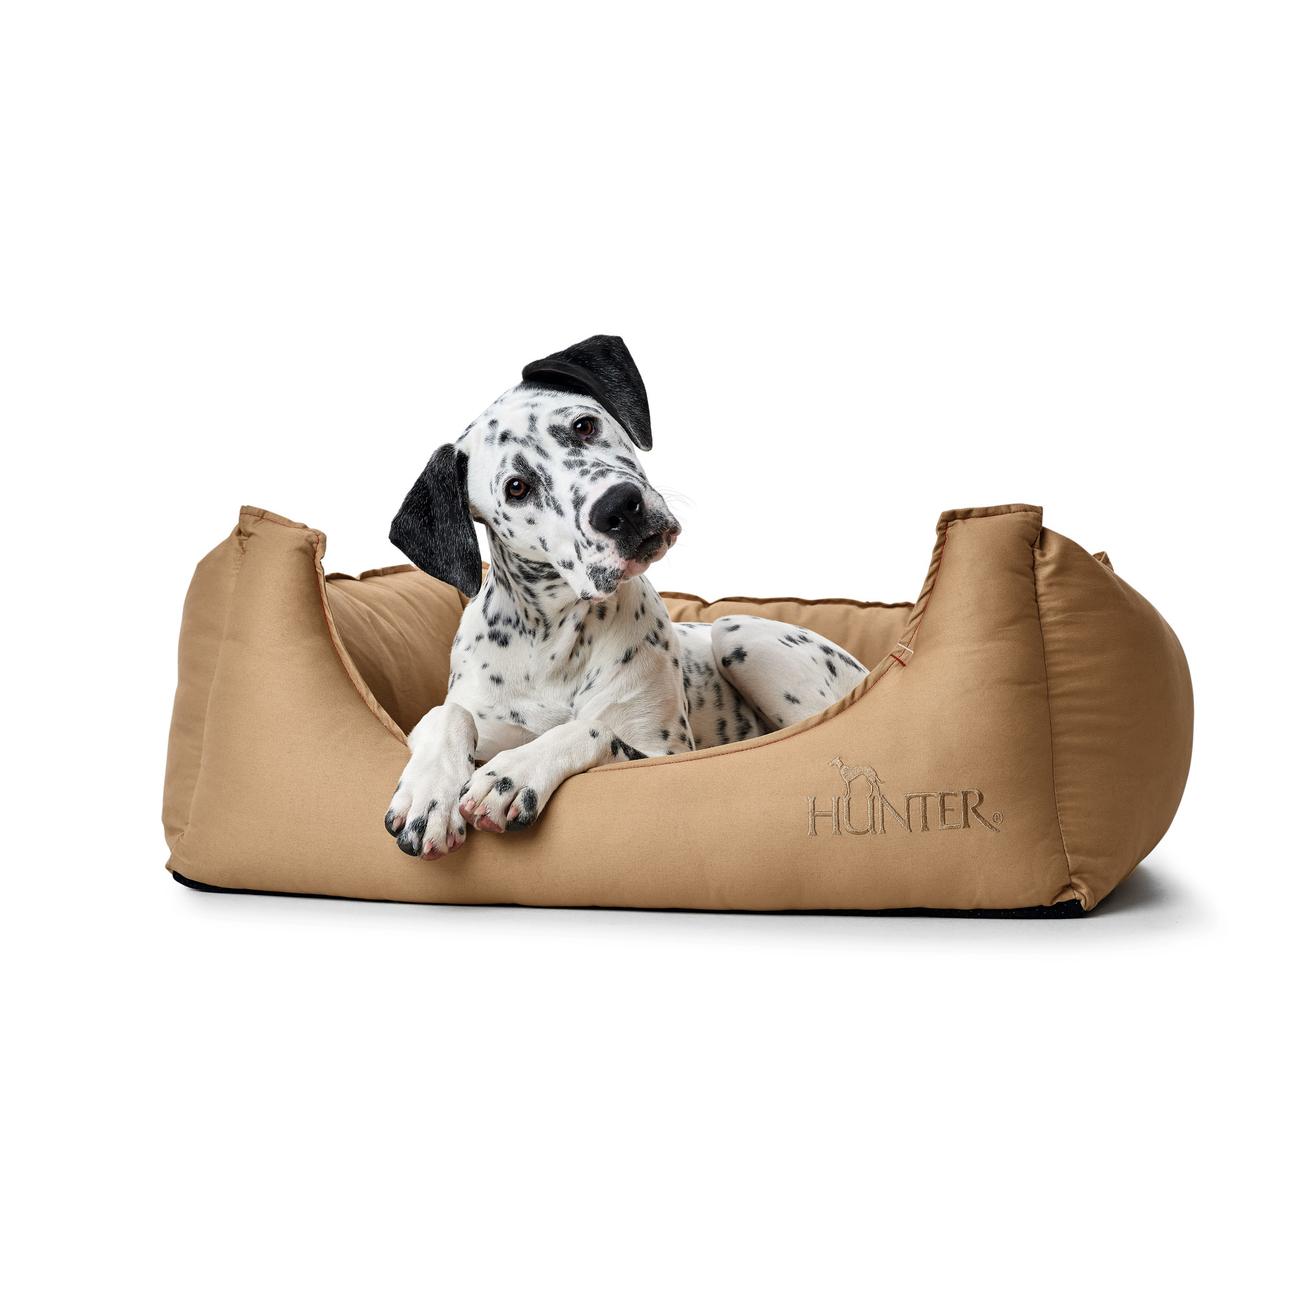 Hunter Hundesofa Sanremo 65105, Bild 5